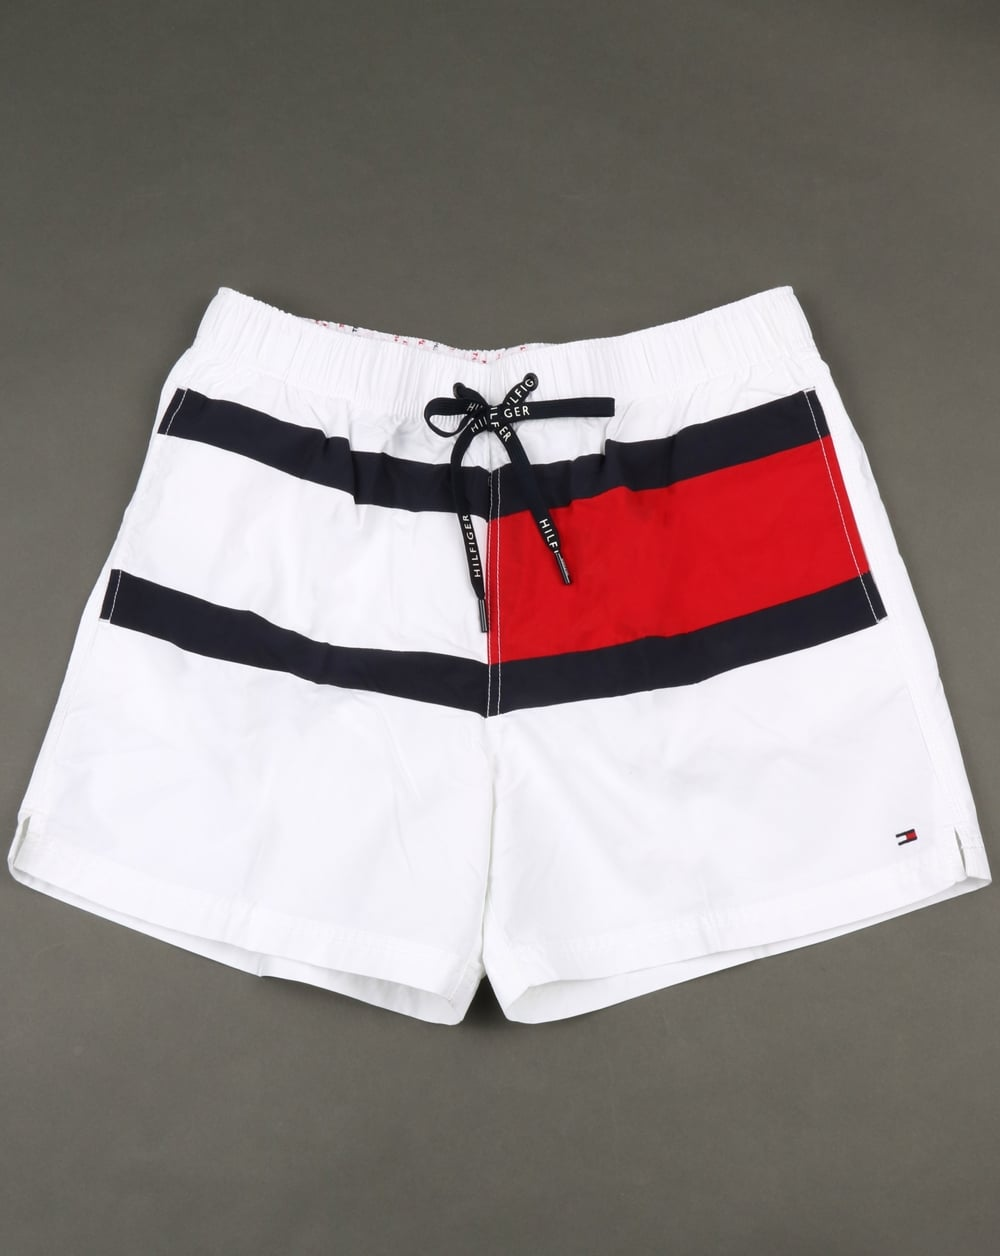 31b25635c Tommy Hilfiger Flag Swim Shorts Bright White,beach,swimmers,holiday